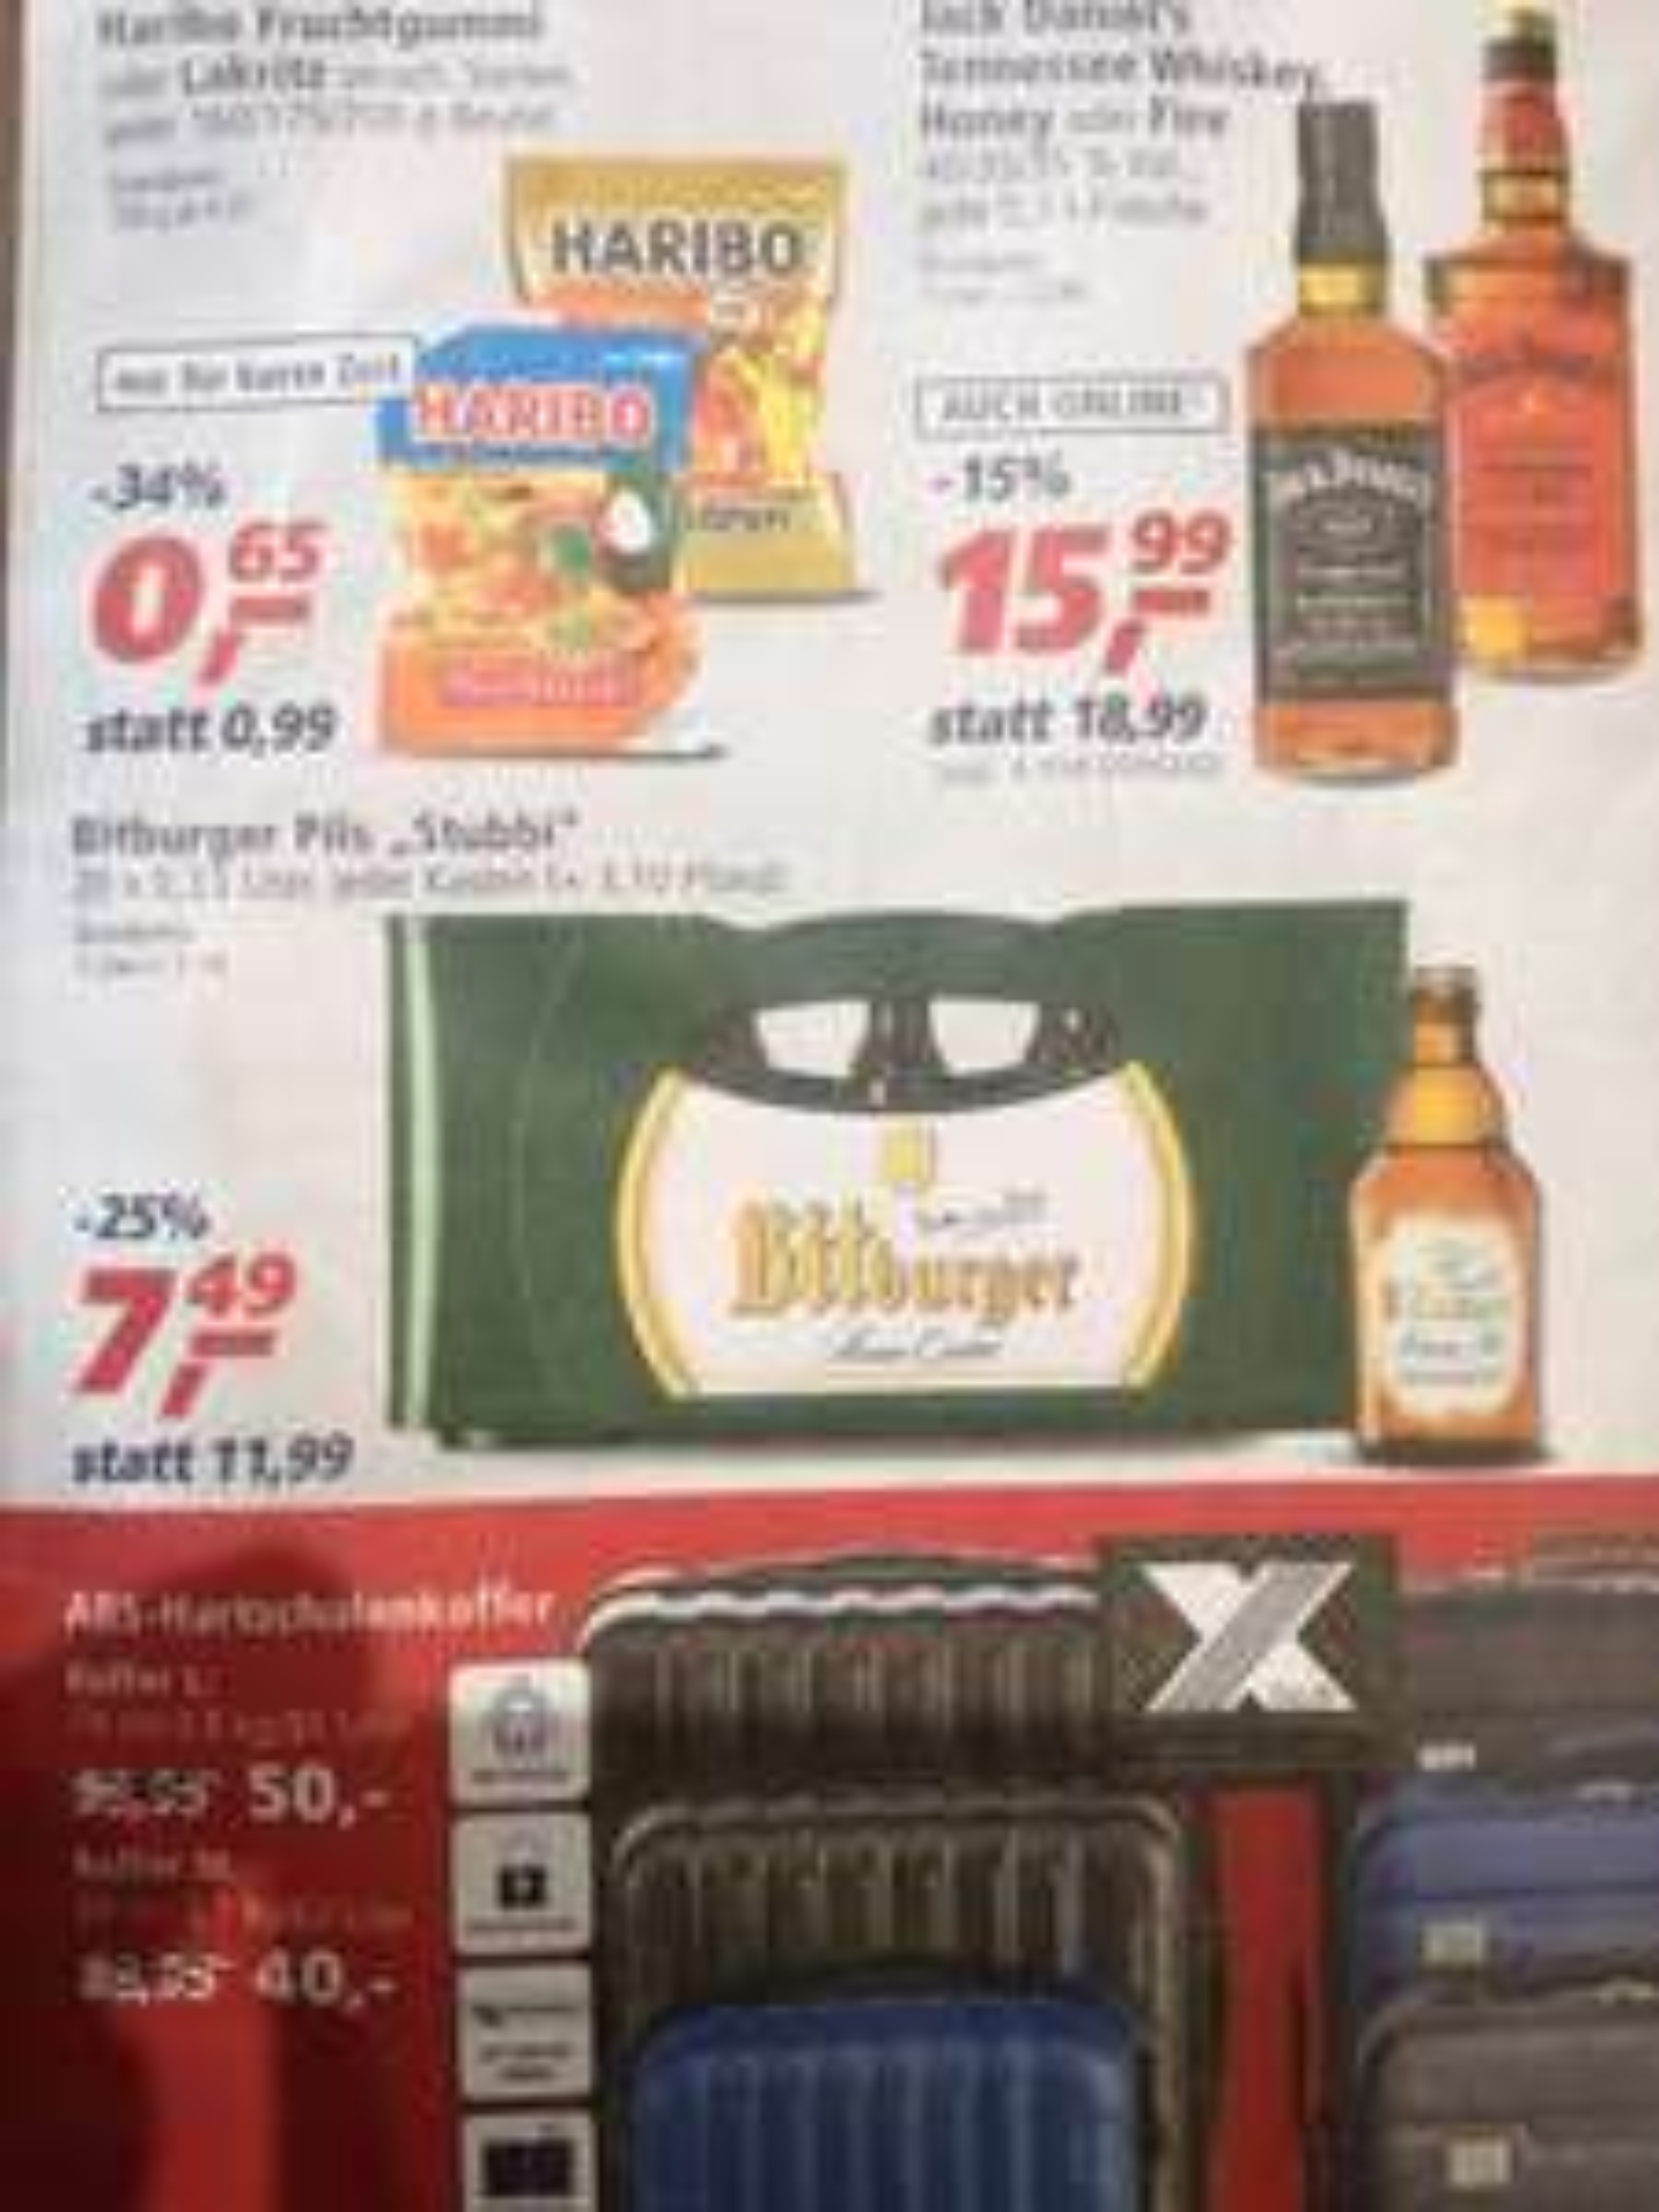 (Lokal) Real Trier und Kenn Bitburger Pils *Stubbi* 20x0,33L